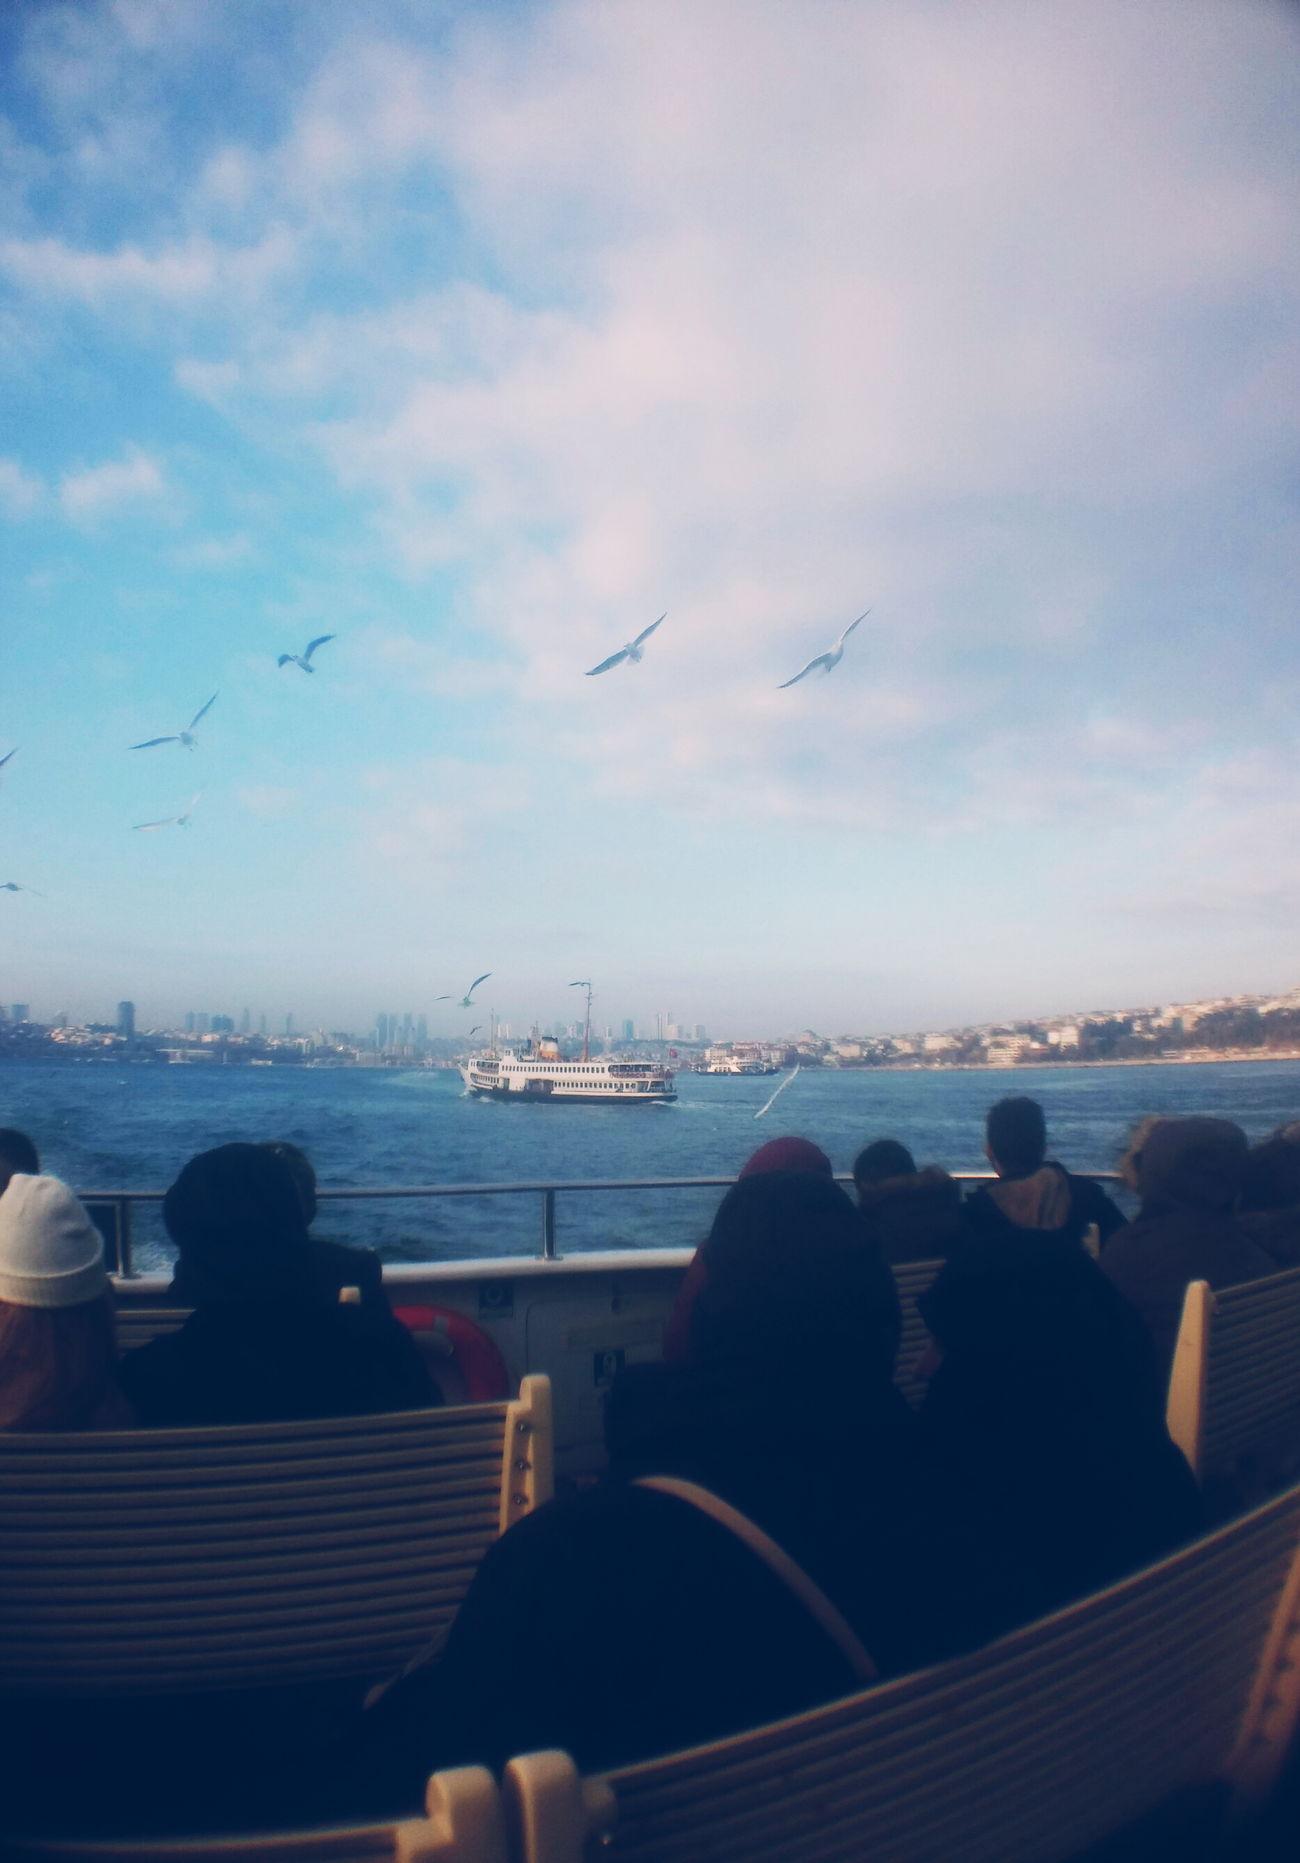 Vapuring Eminönü Kadıköy Vapuru Sea Seagulls Sky People Clouds Cityscape Nitenite VSCO Vscoistanbul Vscocam